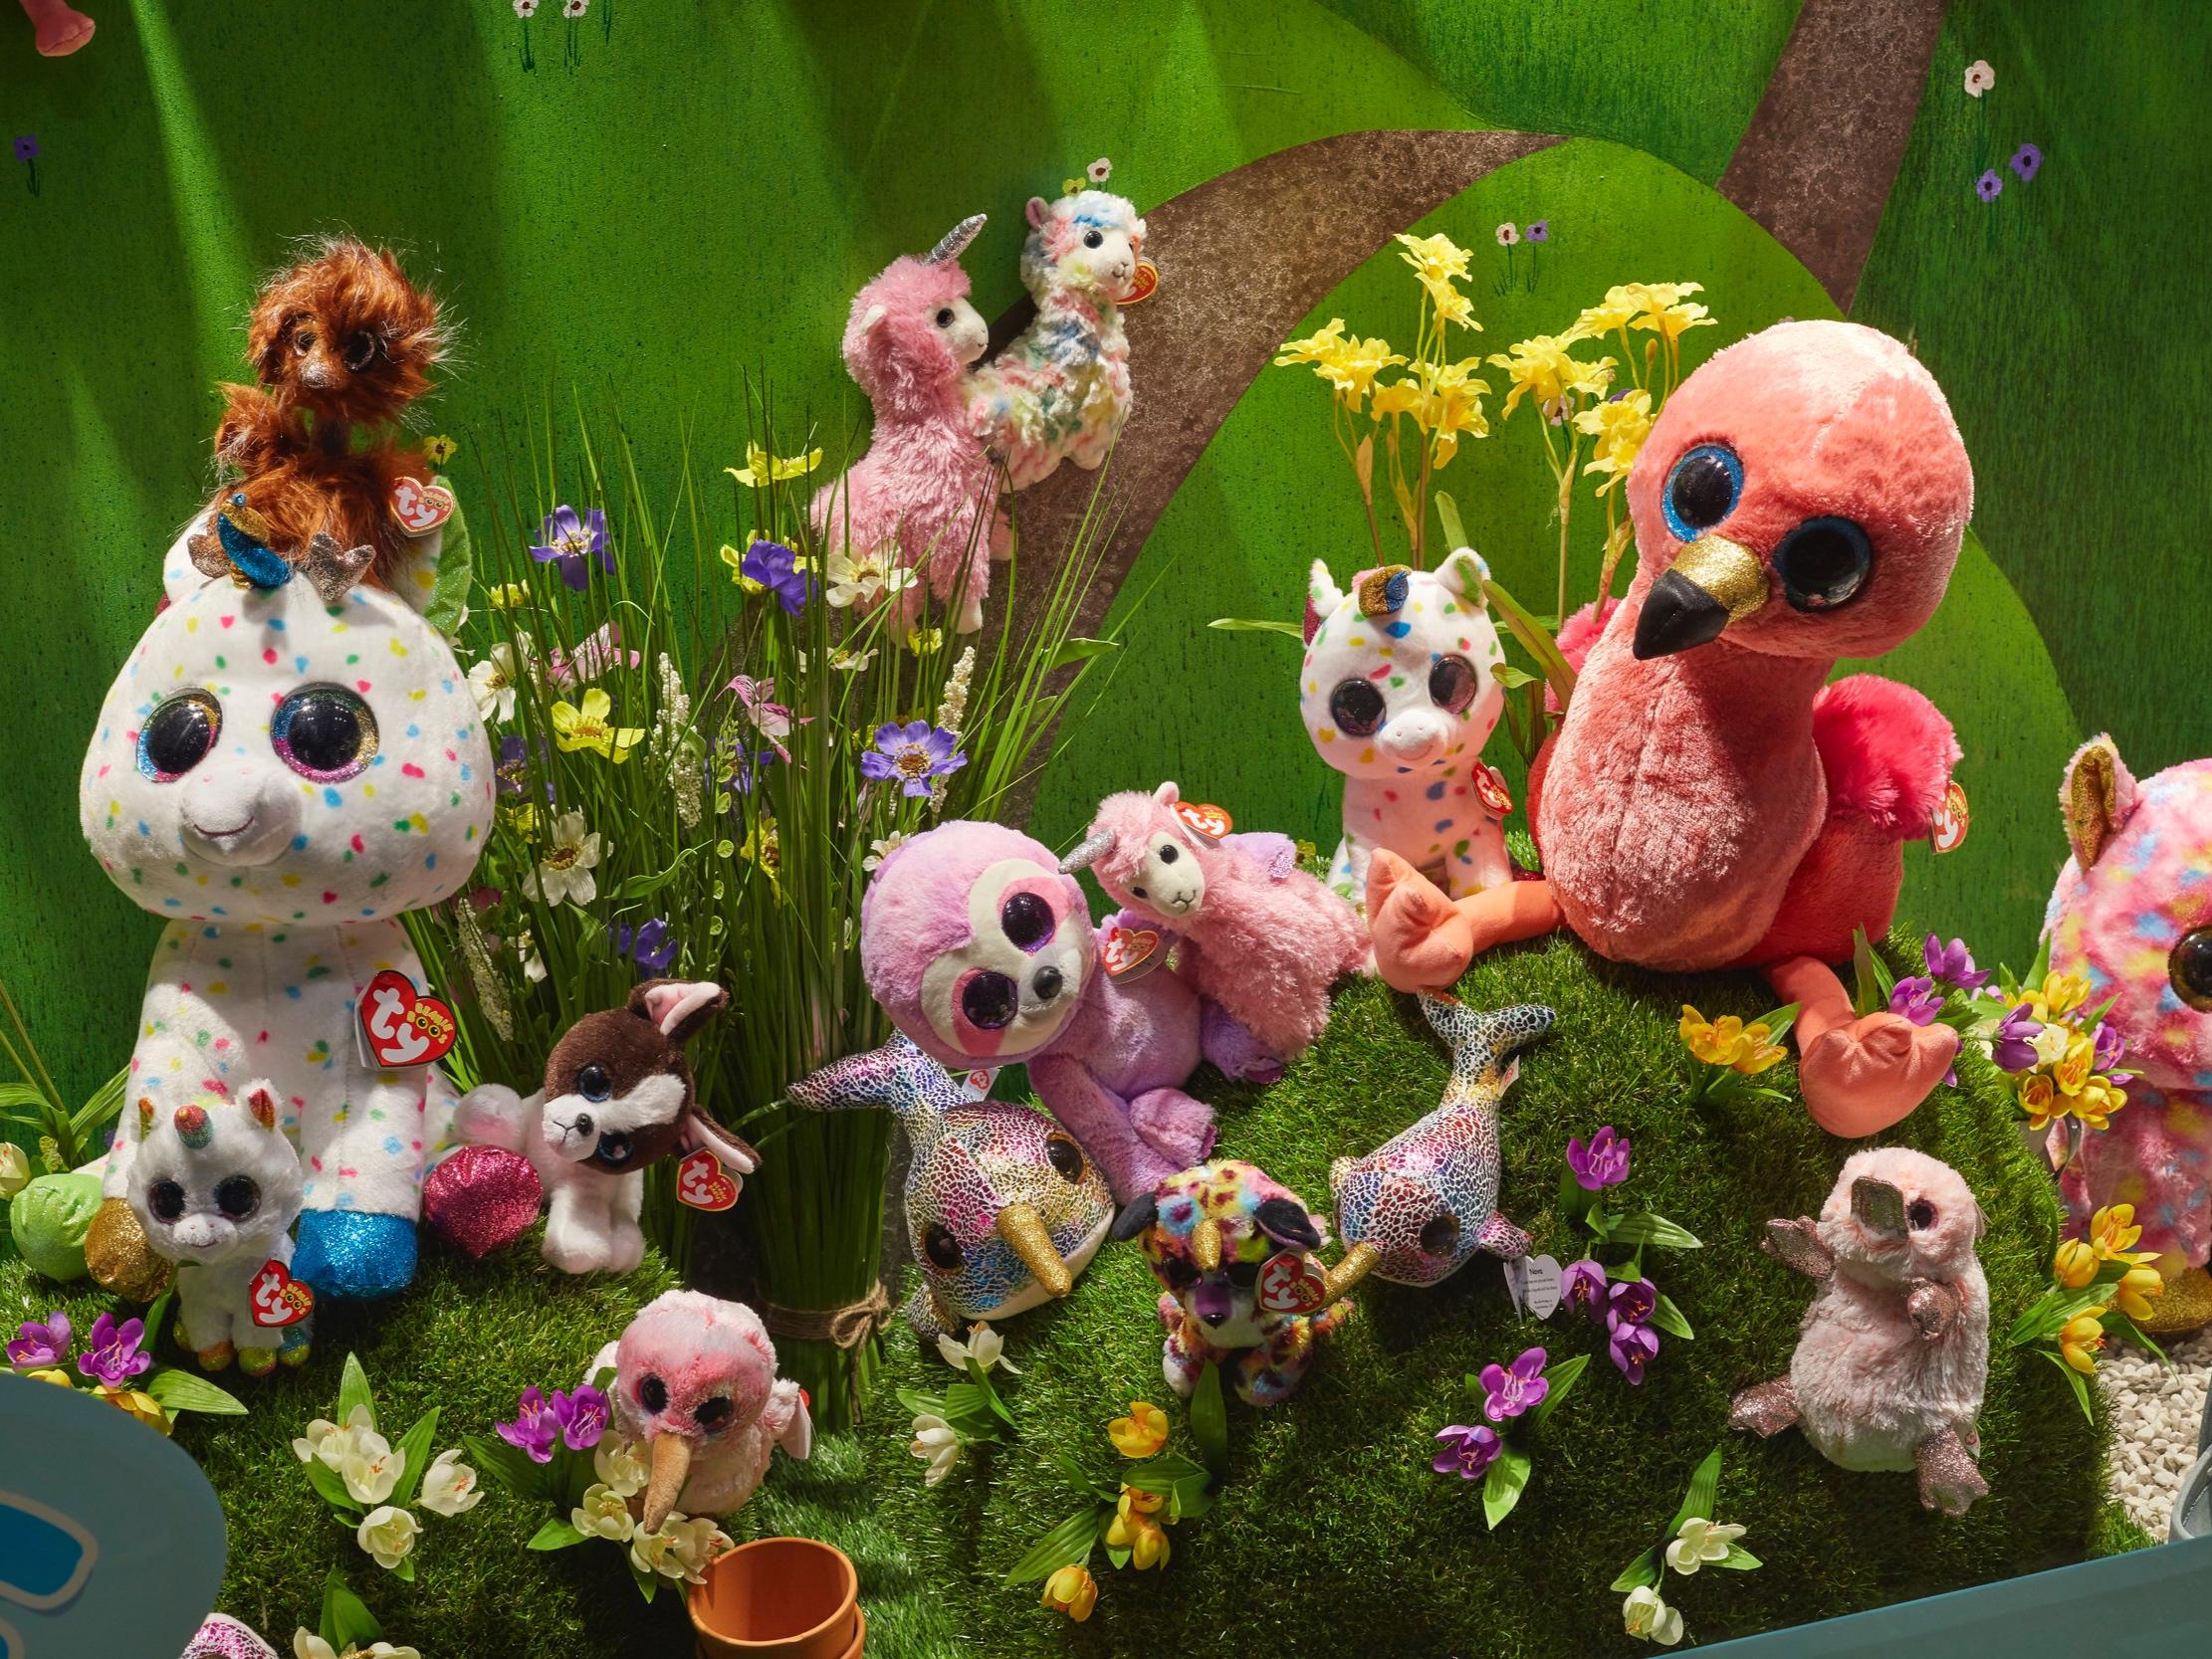 Hamleys Beenie Boos with Flourish Foliage and flowers.jpg